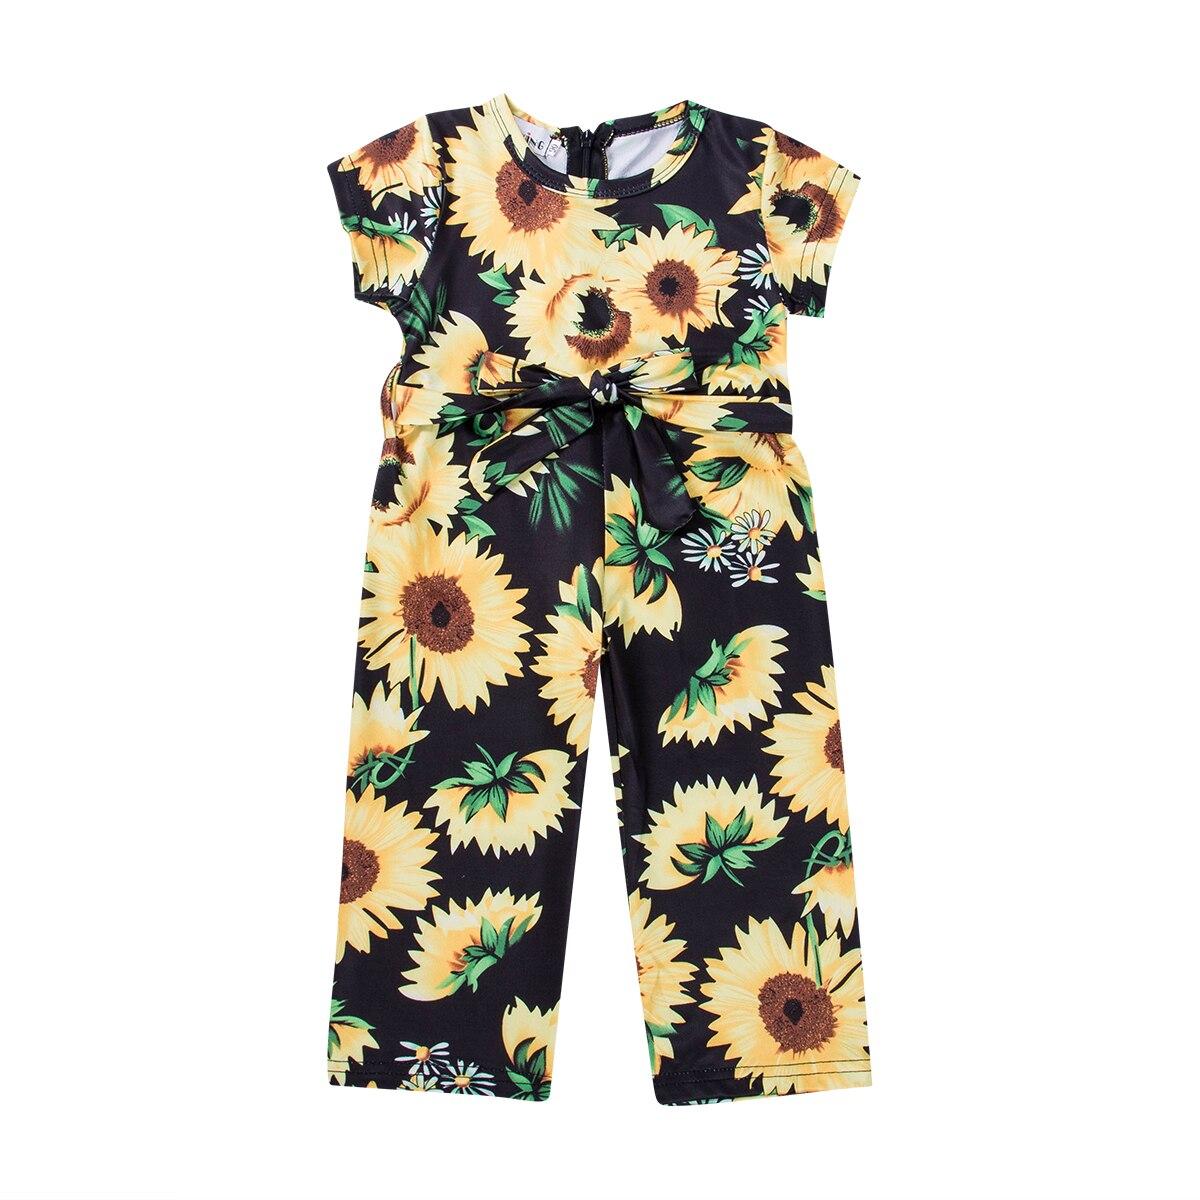 2019 Summer Toddler Kids Baby Girl Sunflower Romper Short Sleeve Belt Bow Princess Girls Jumpsuit Playsuit Sunsuit Clothes